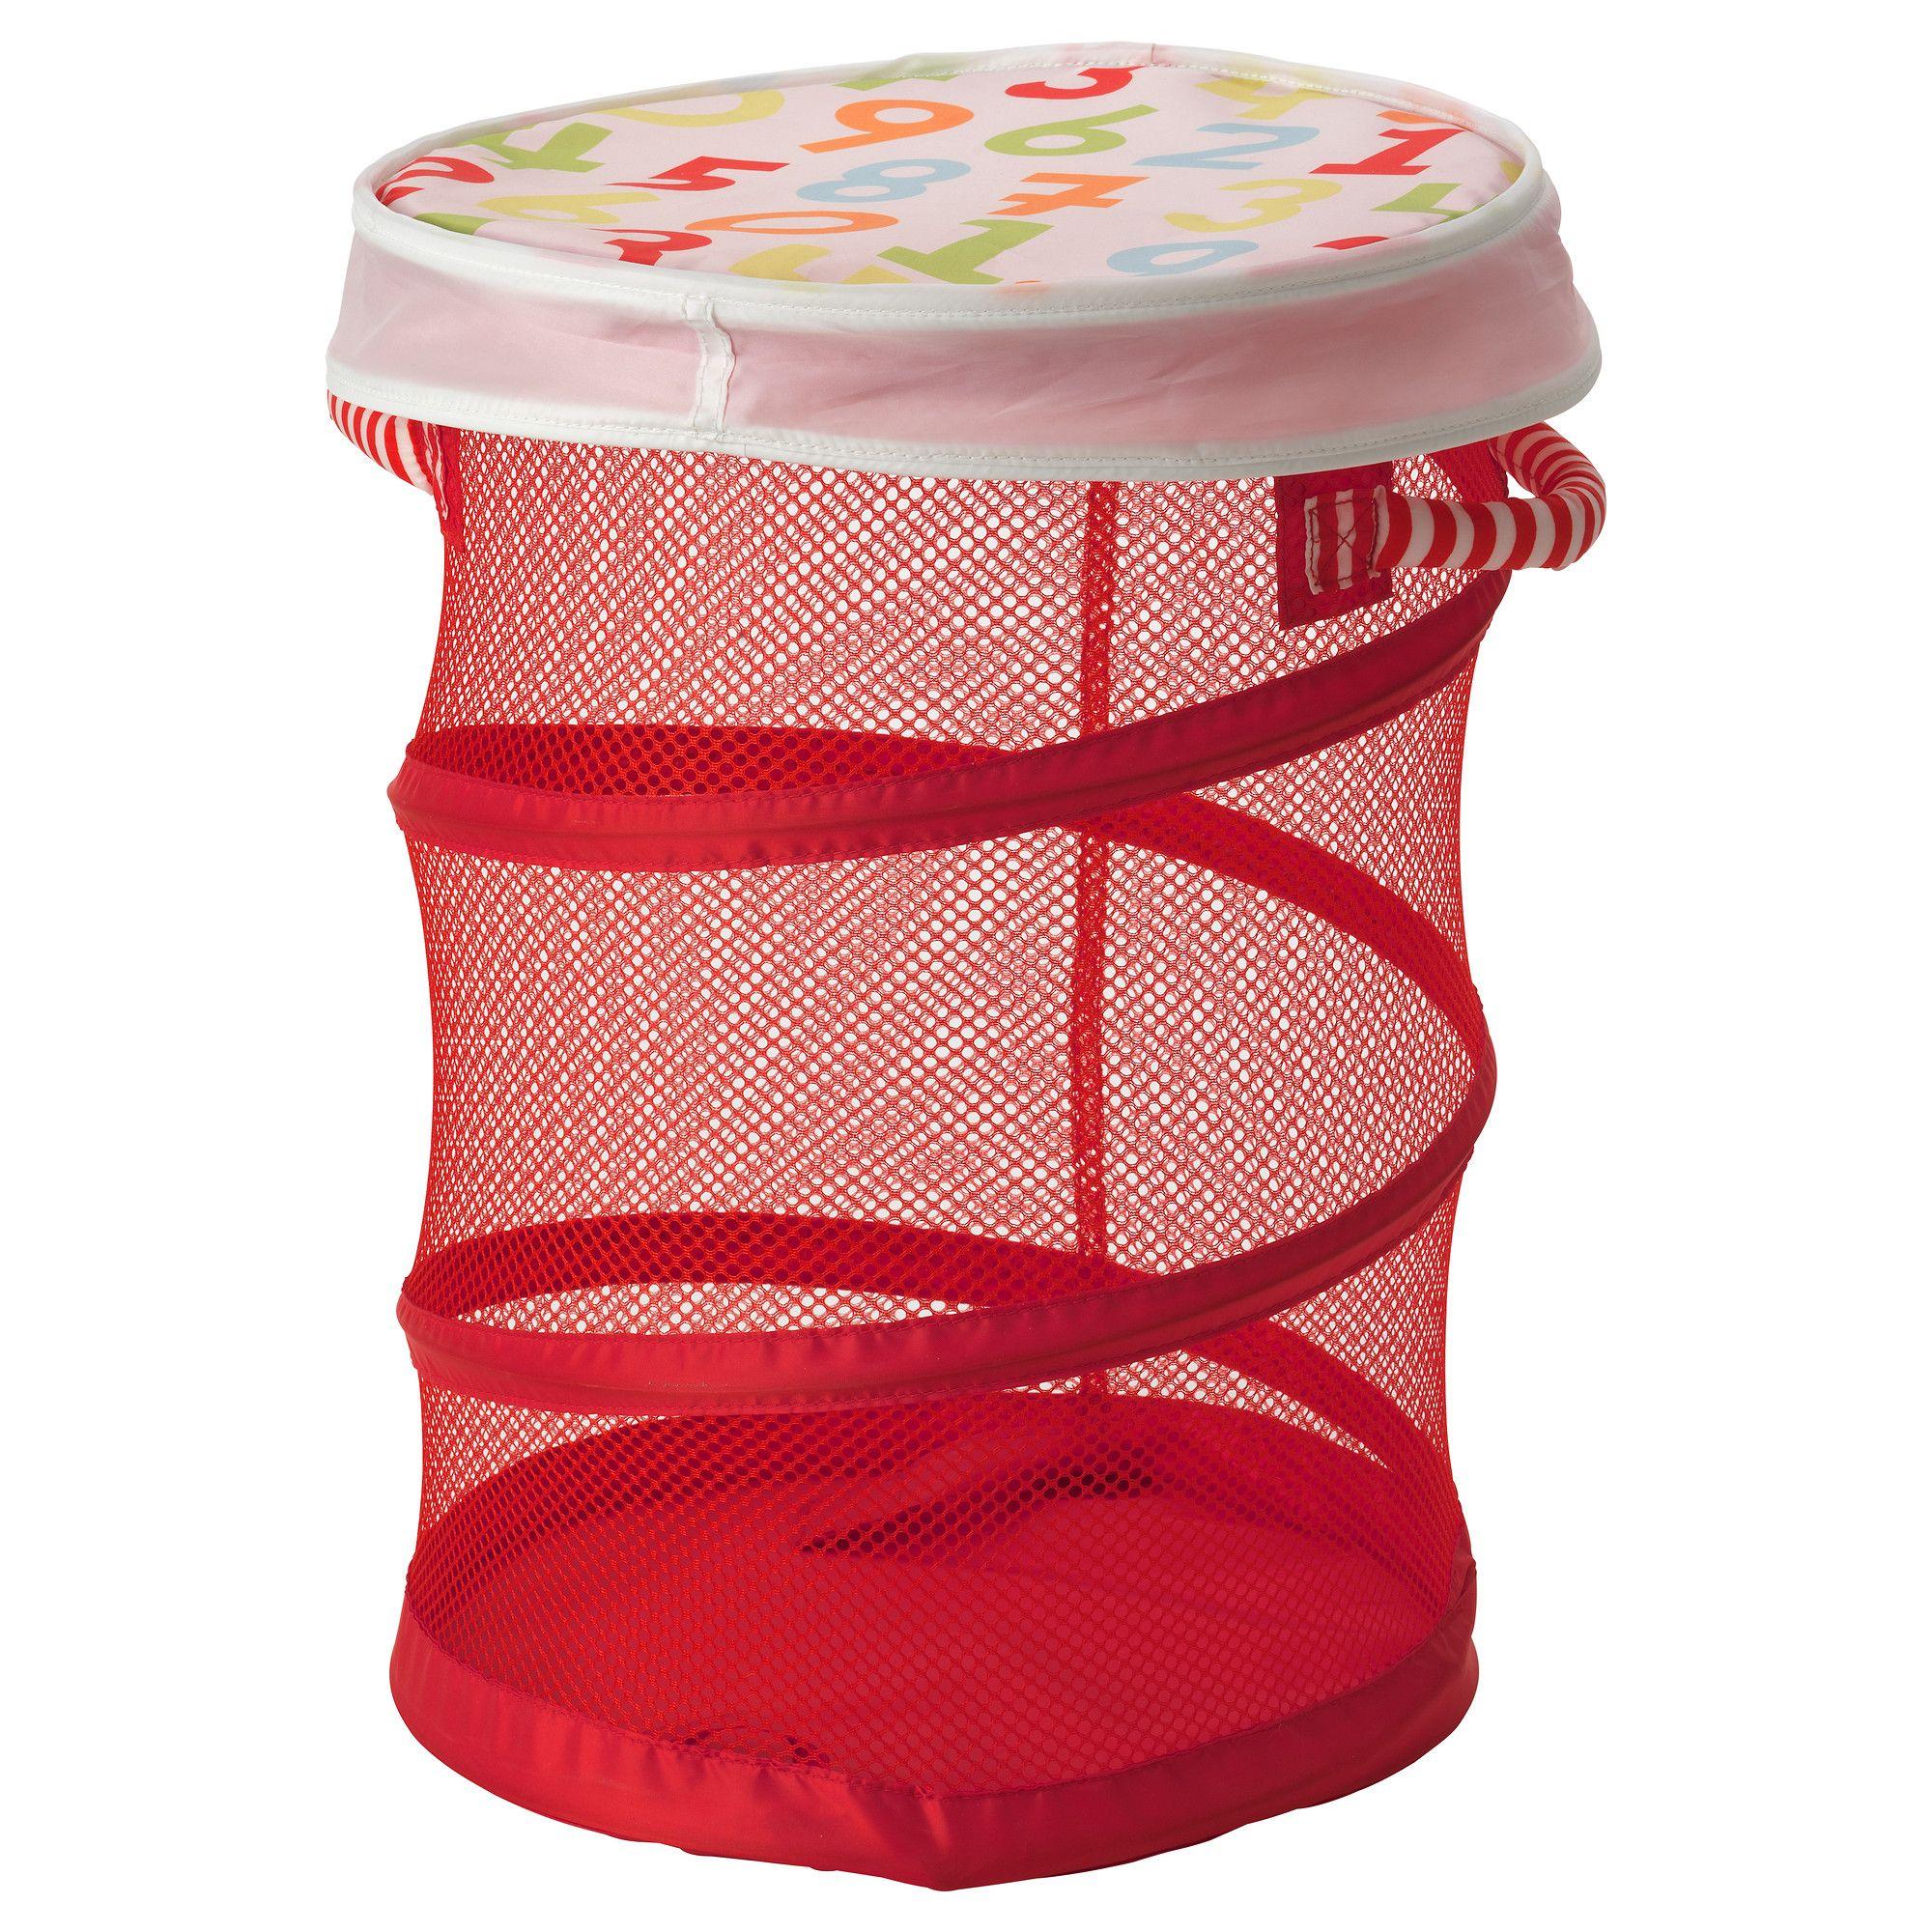 kusiner corbeille filet couvercle rouge ikea coups. Black Bedroom Furniture Sets. Home Design Ideas